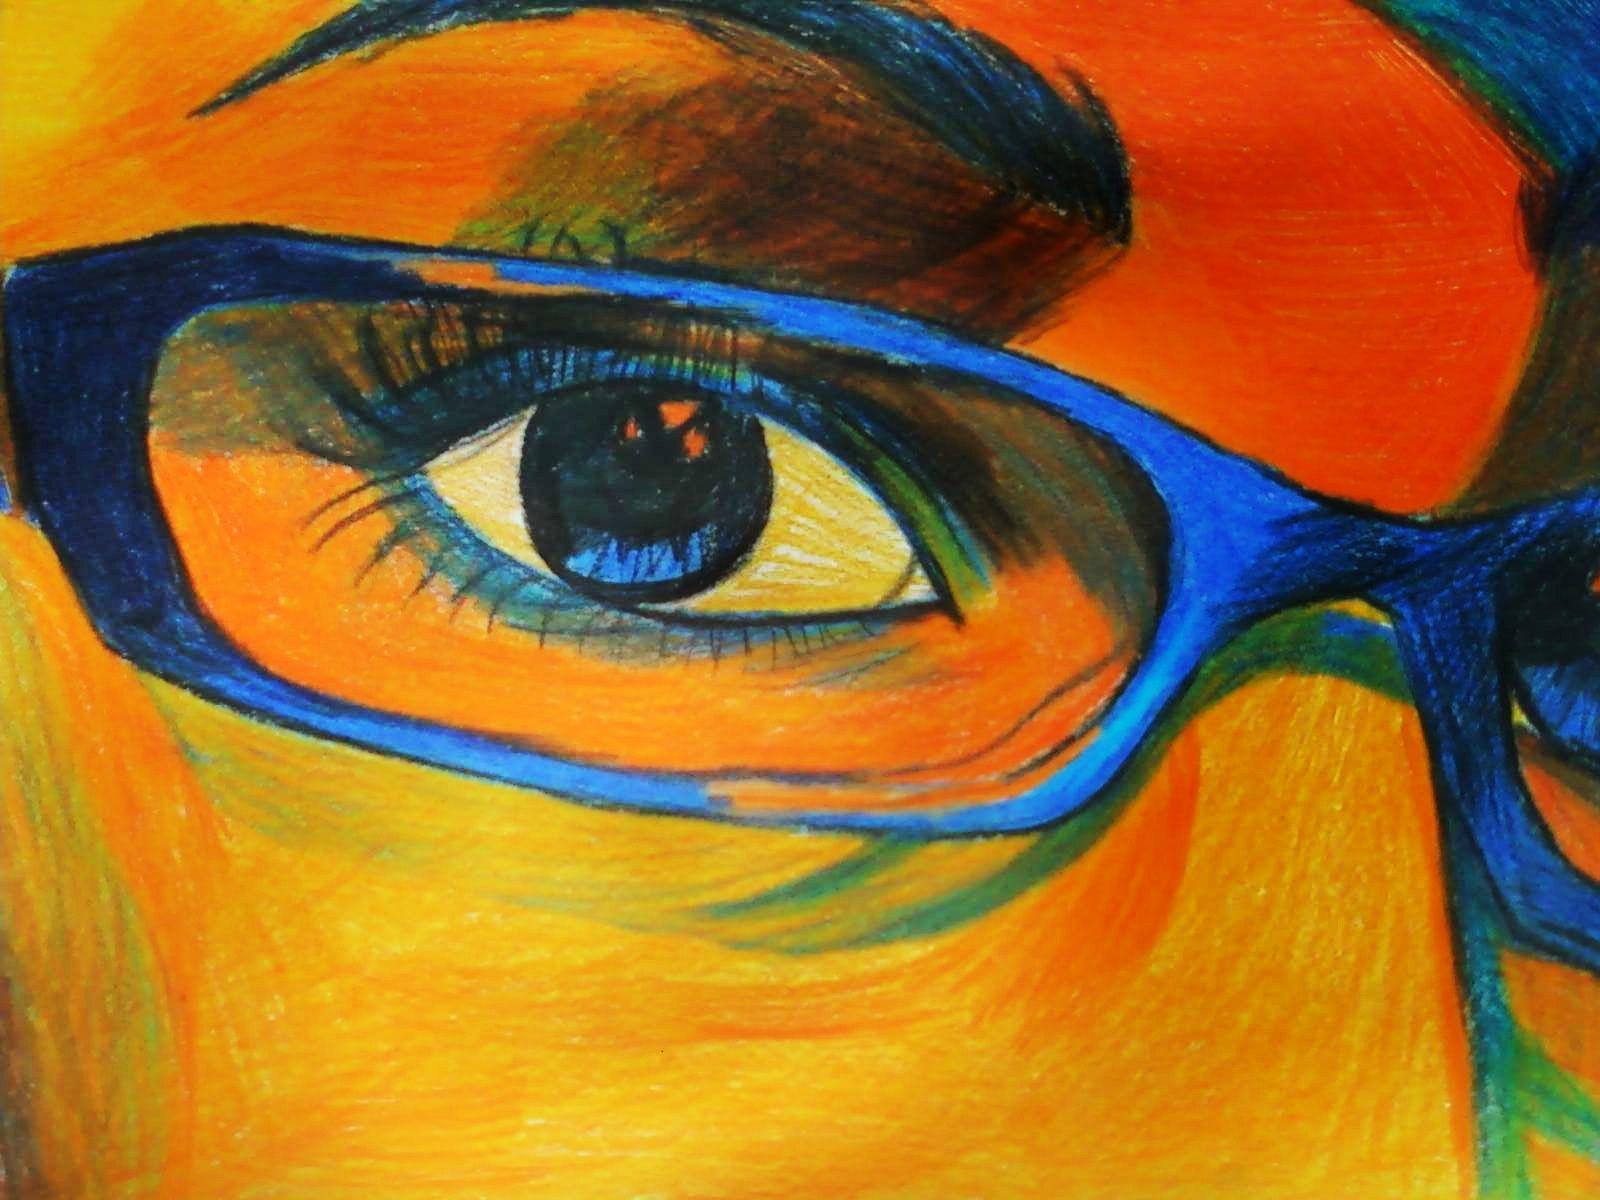 Color art facebook - Color Art Facebook 1